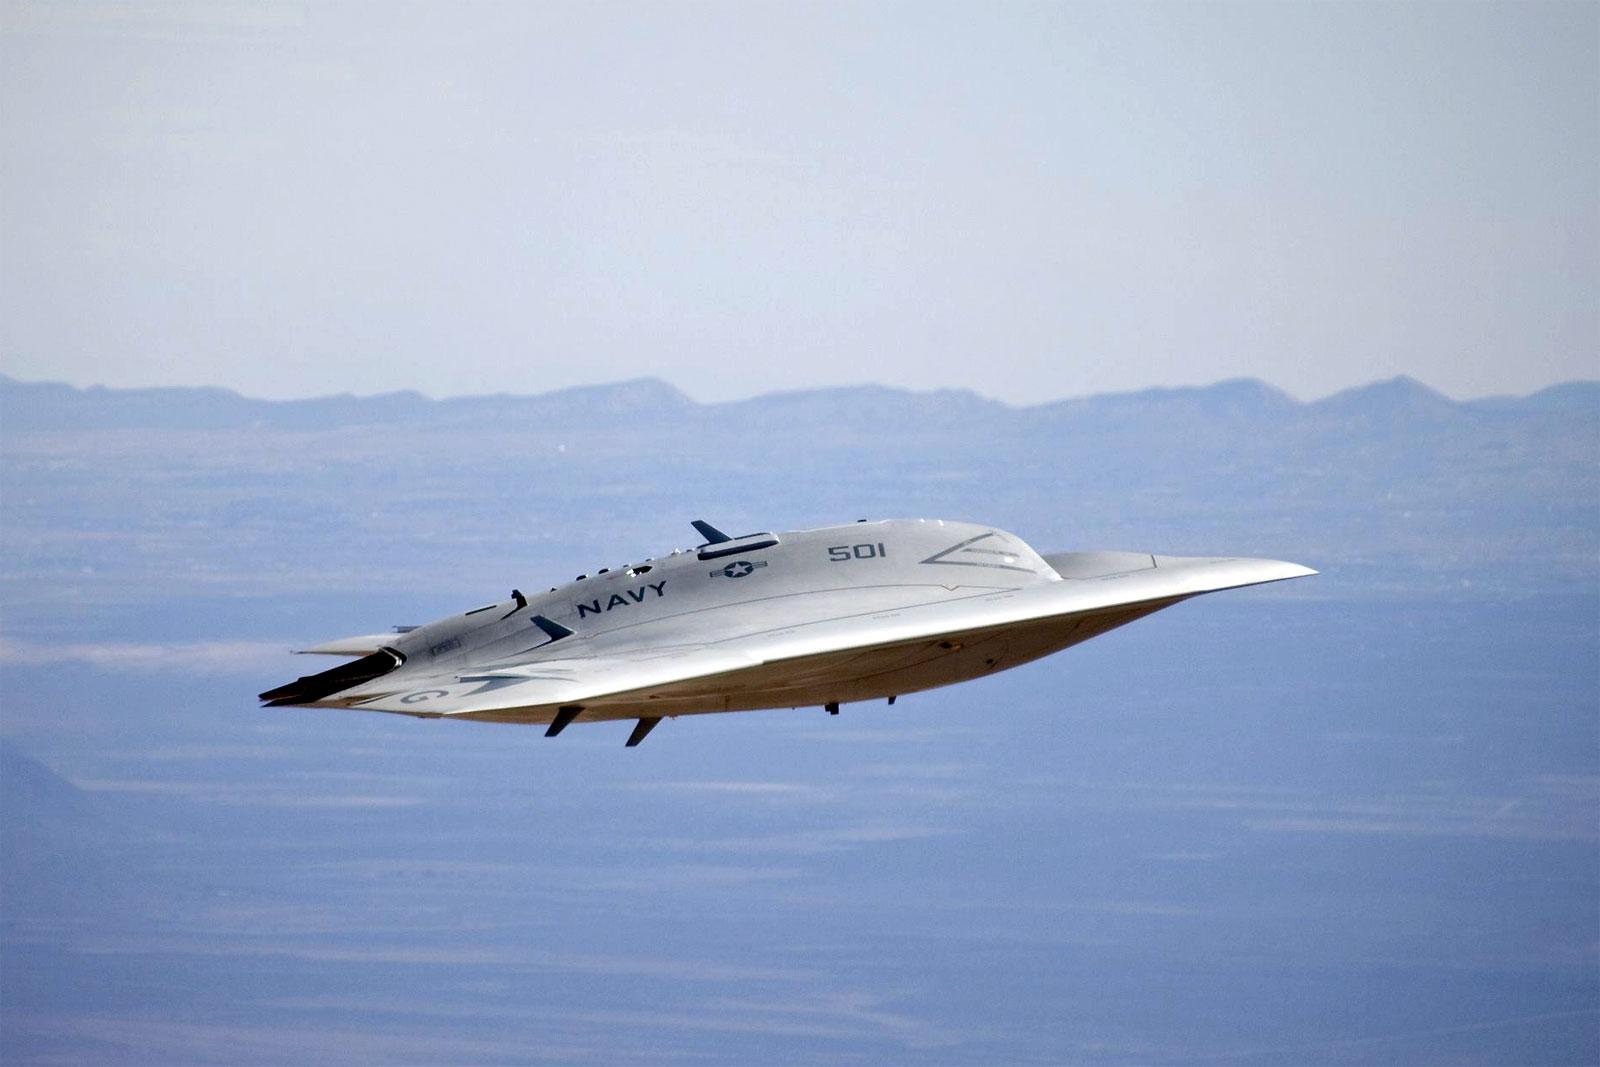 47b unmanned combat air system (ucas)